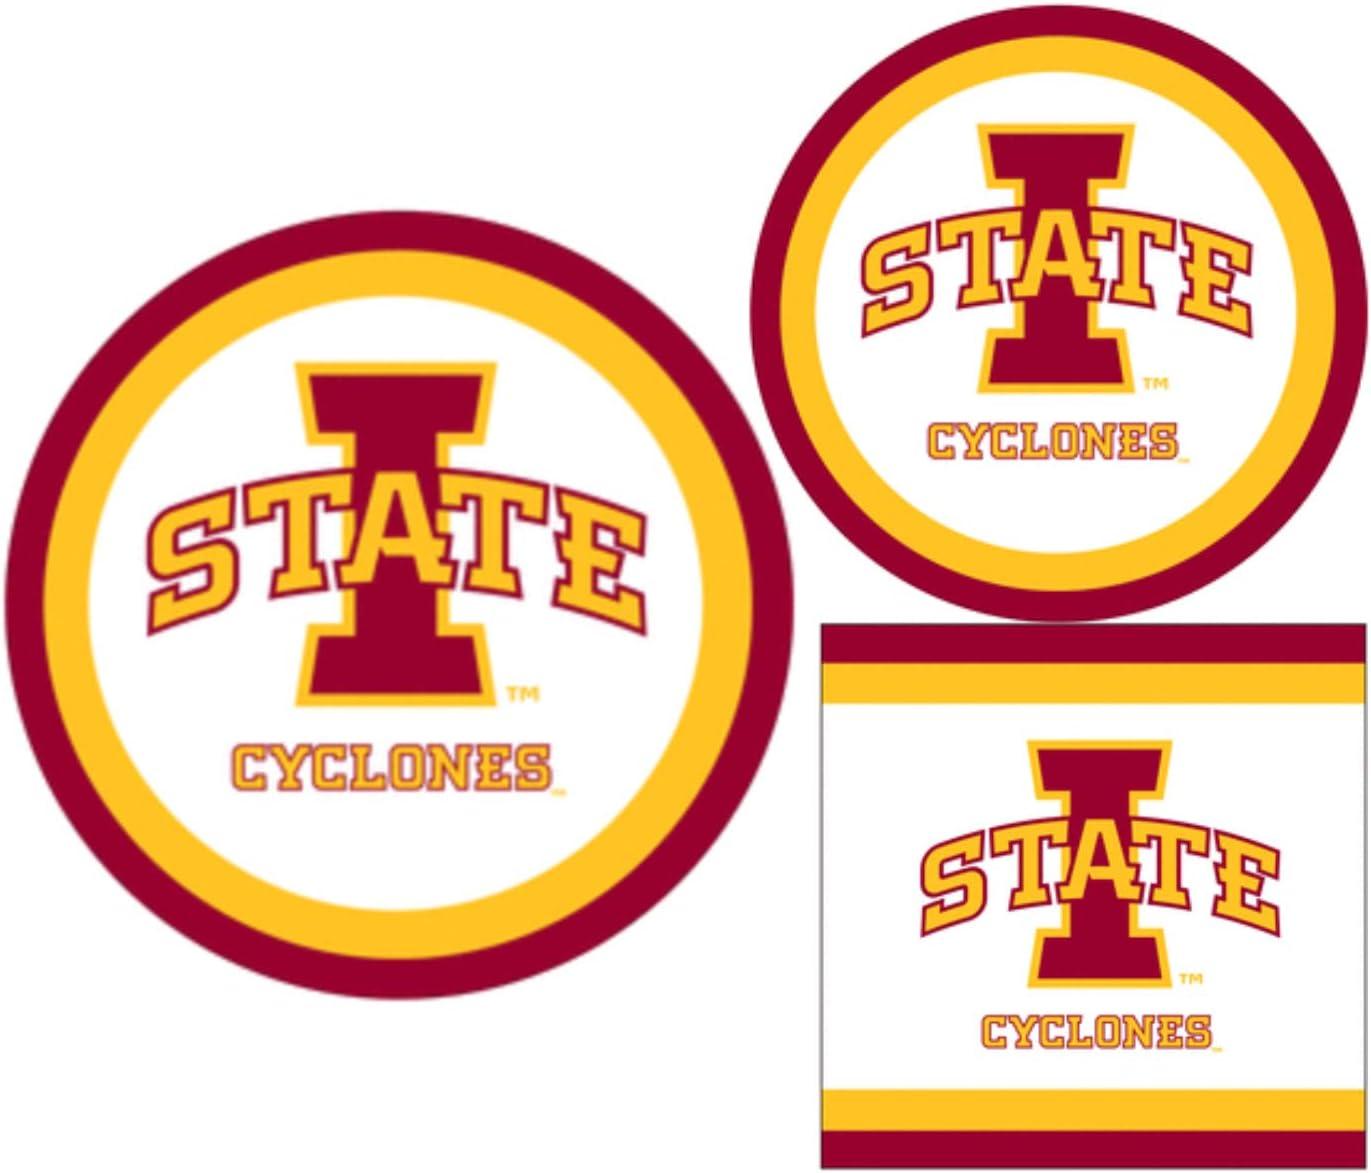 Siskiyou NCAA Iowa State Cyclones Home Decal 5 Inch